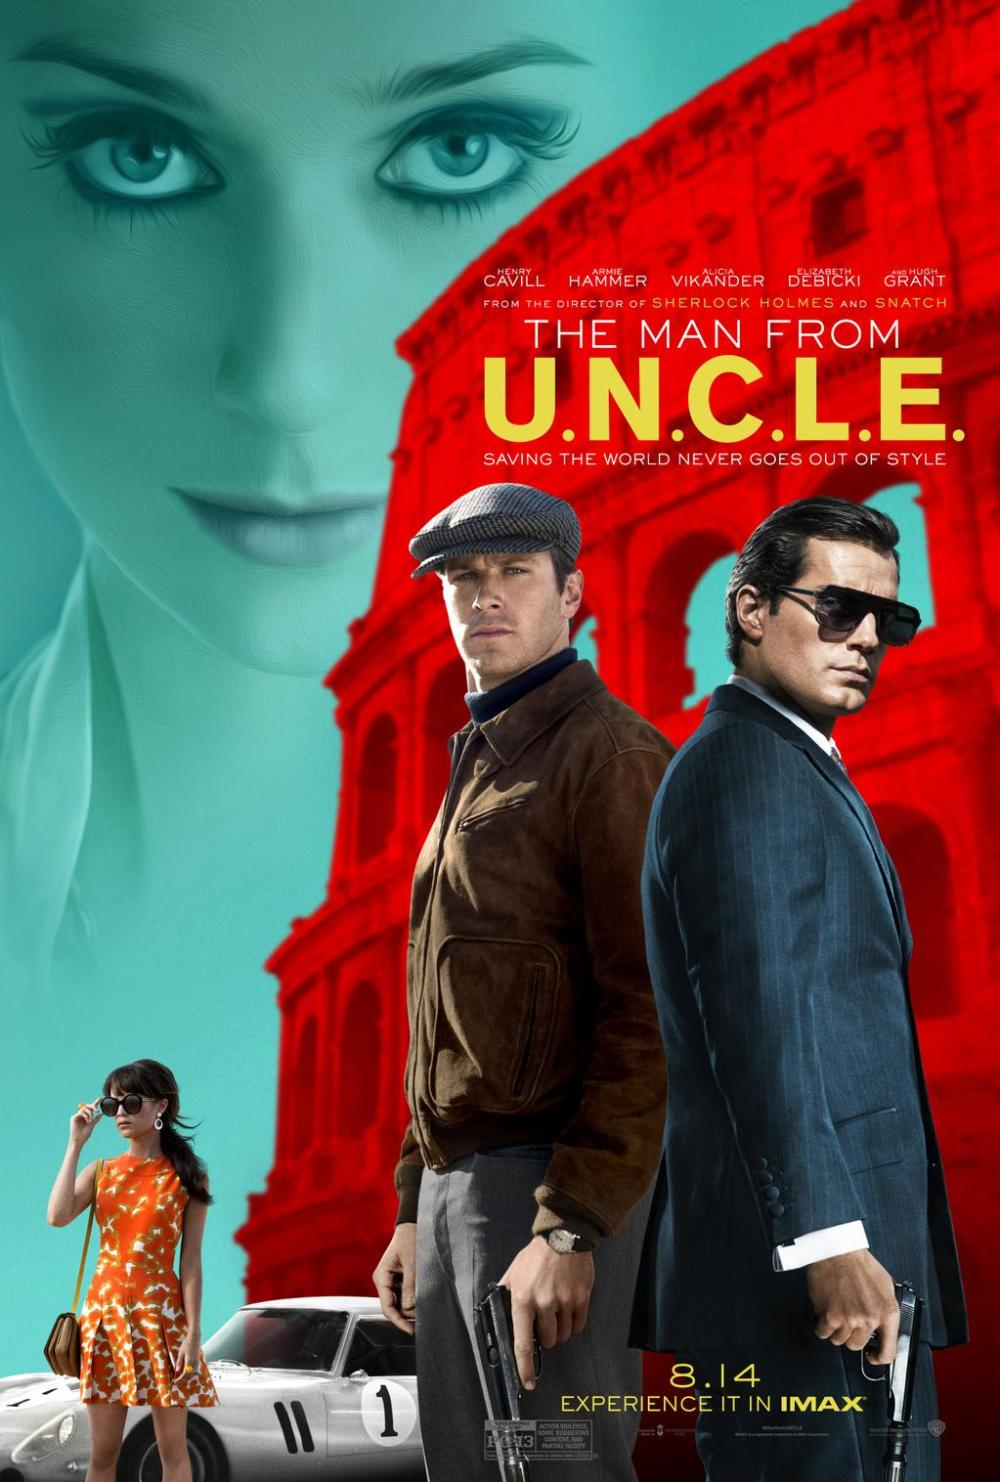 Gloednieuwe trailer & poster 'The Man from U.N.C.L.E.'